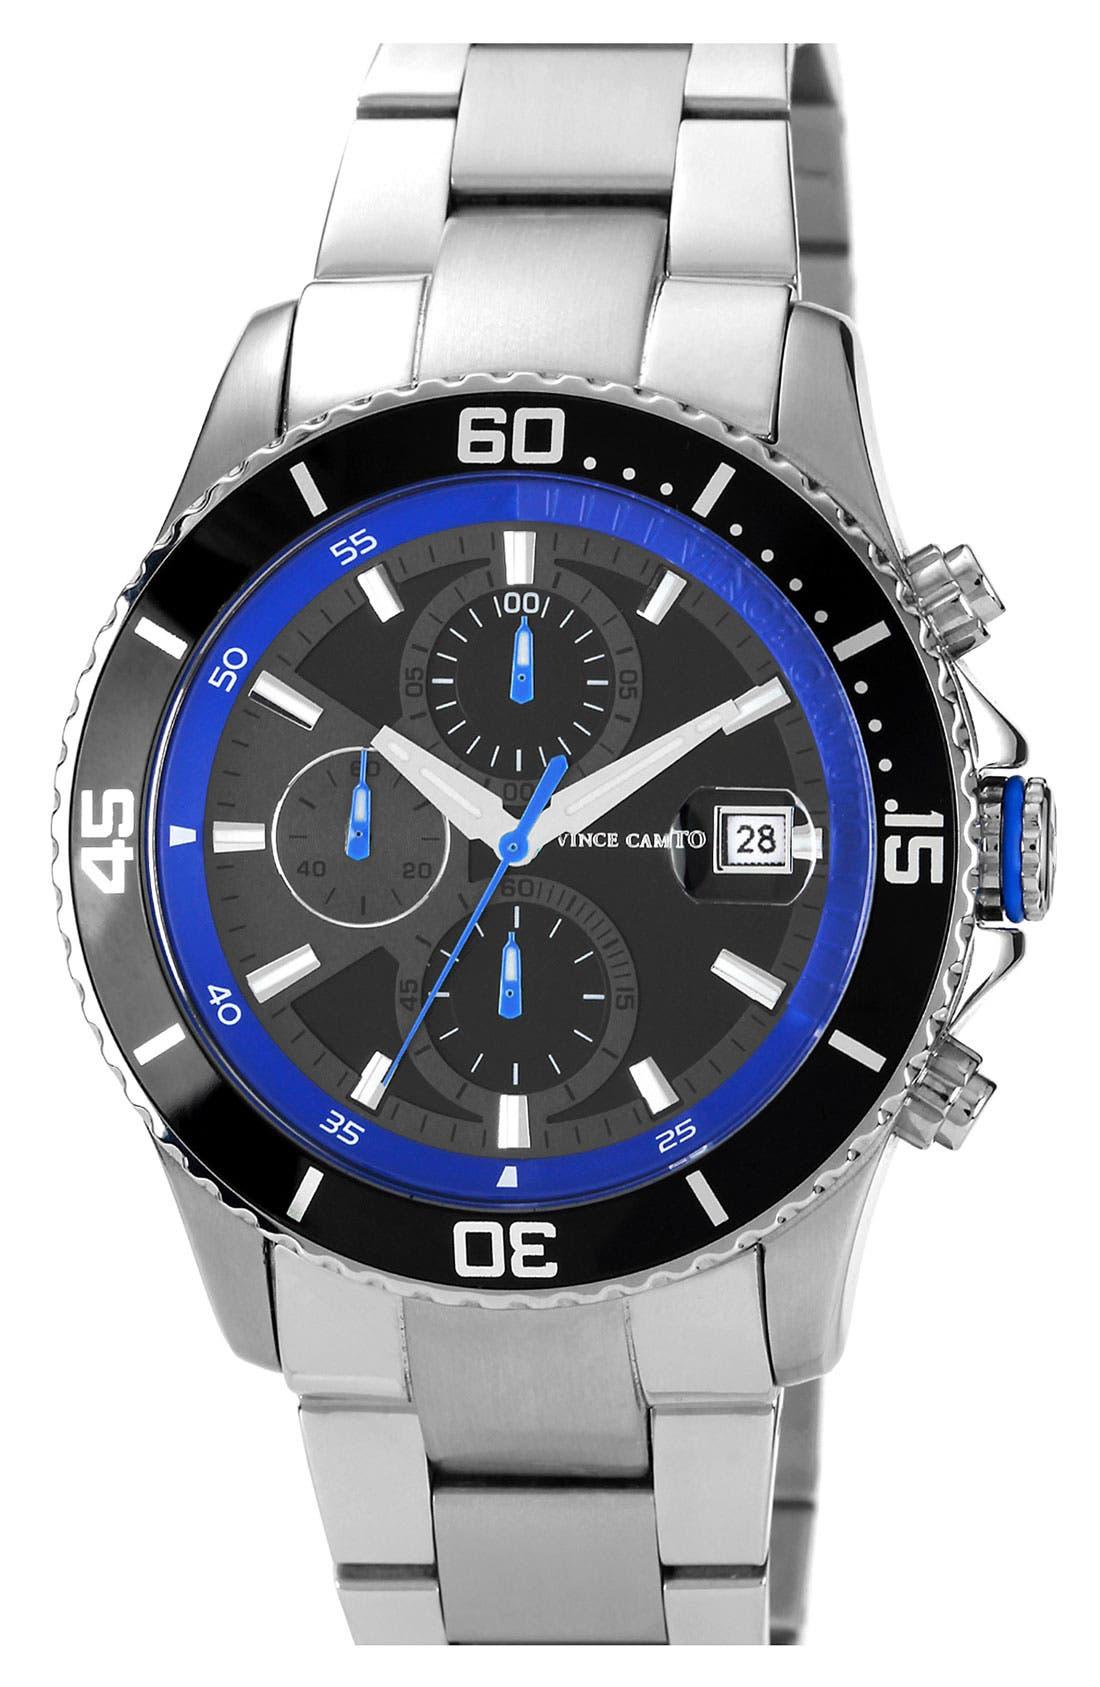 Main Image - Vince Camuto 'Cavalier' Chronograph Bracelet Watch, 45mm